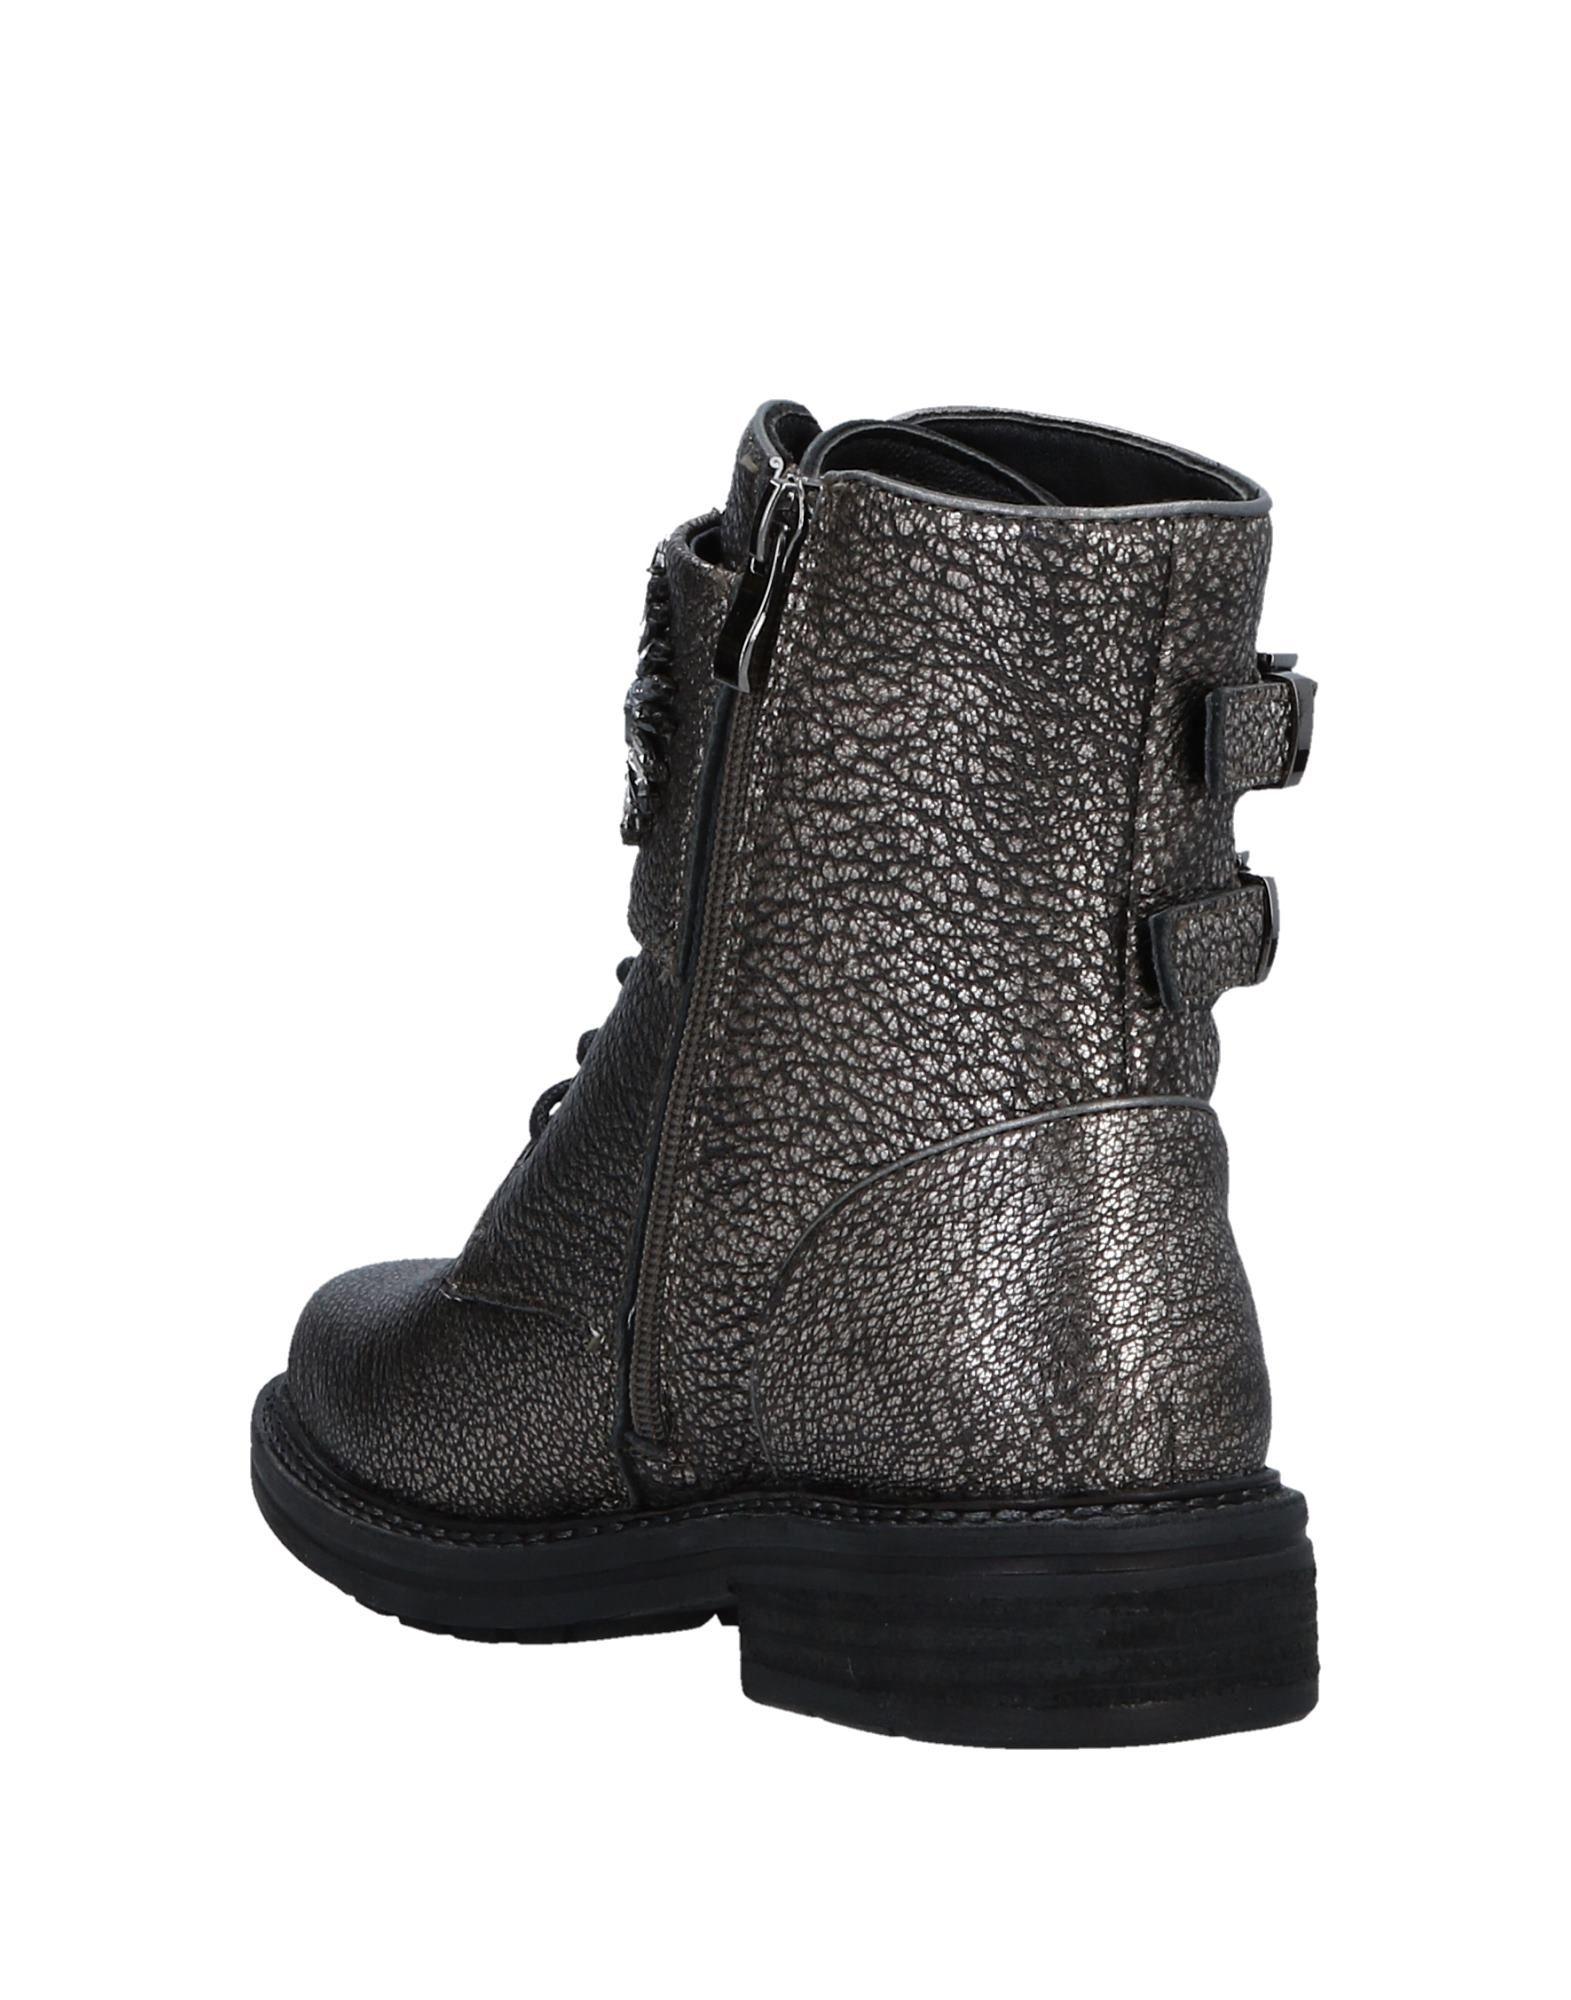 Alma En Pena. Stiefelette beliebte Damen  11525738GM Gute Qualität beliebte Stiefelette Schuhe 3fd23f